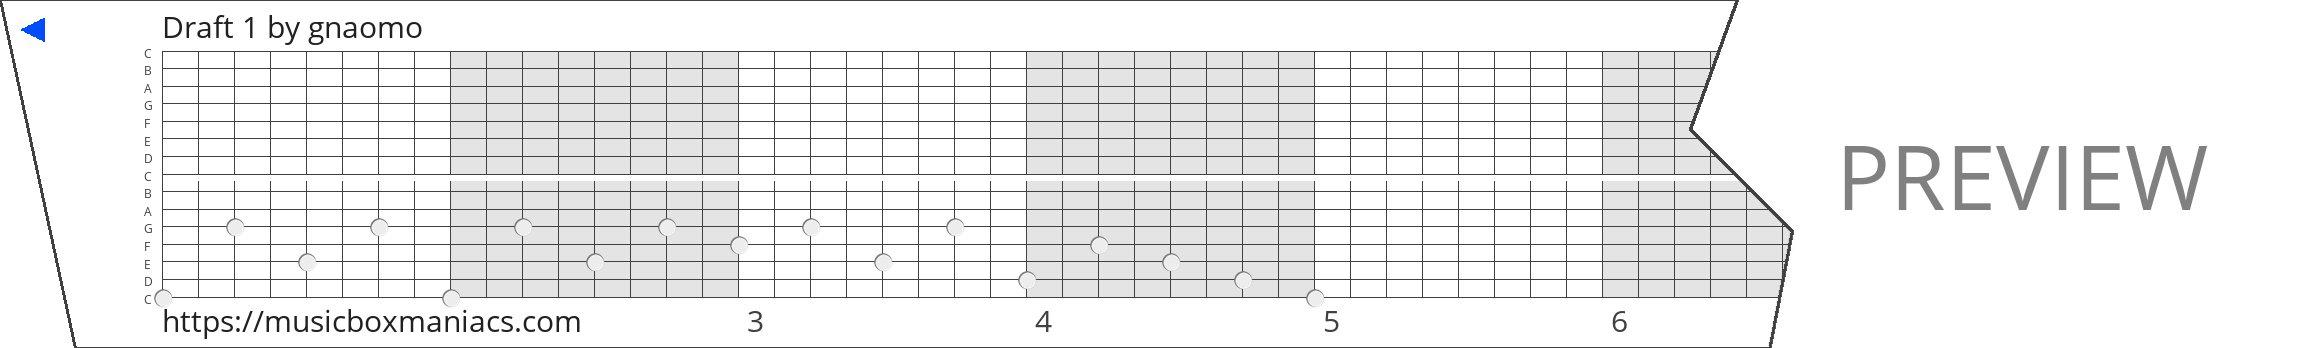 Draft 1 15 note music box paper strip